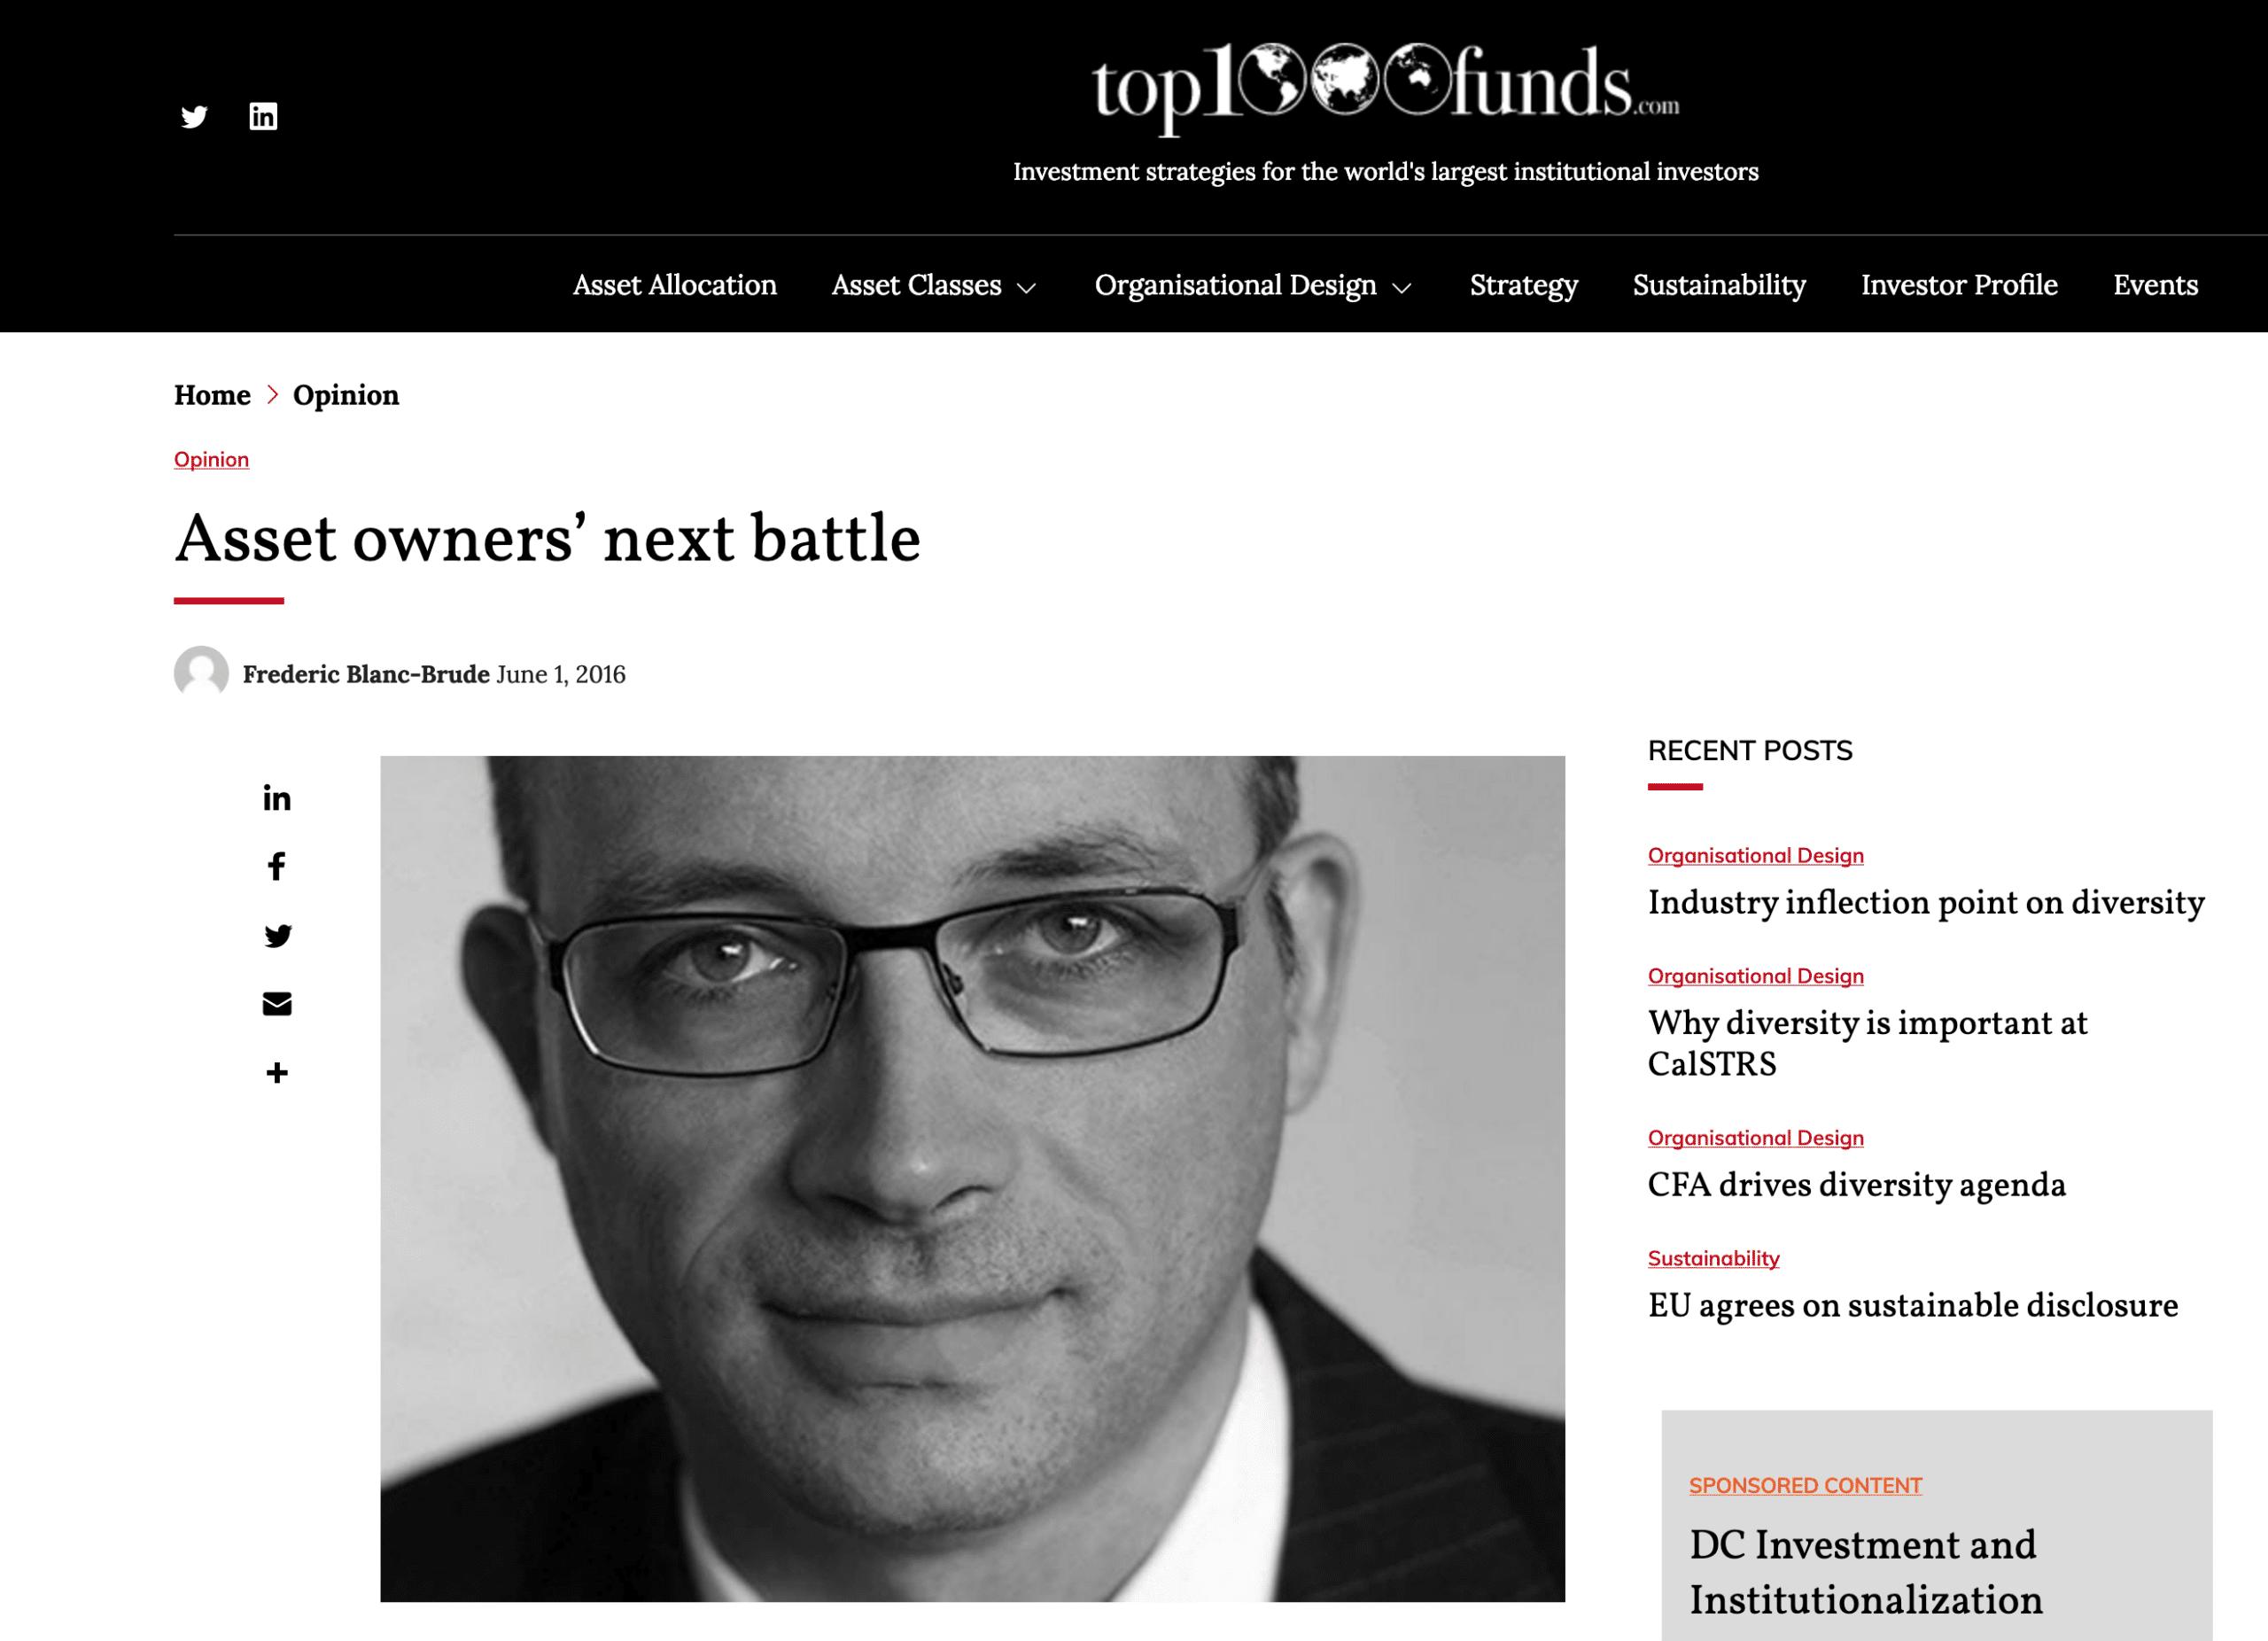 Asset owners' next battle